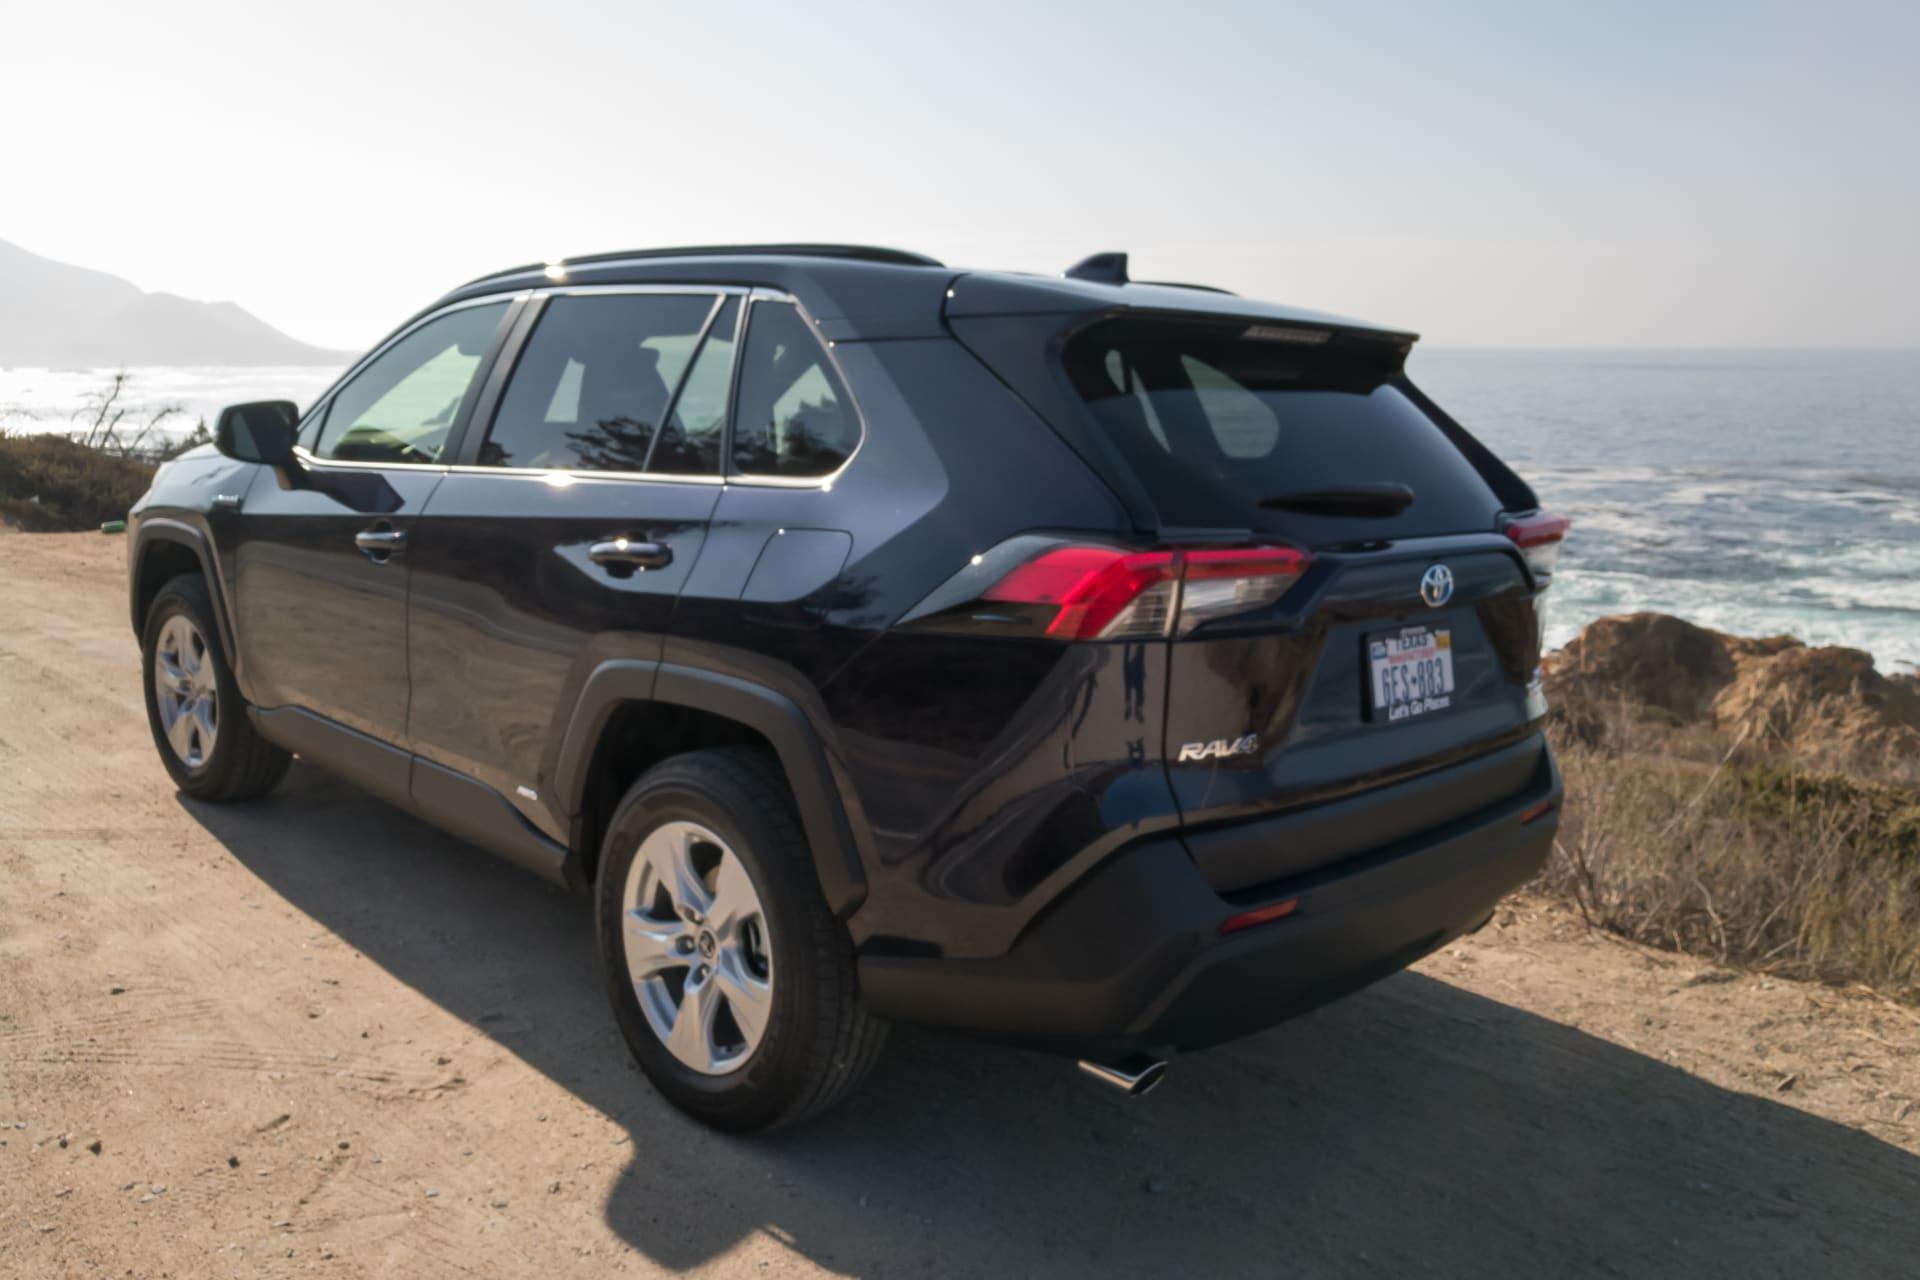 03-toyota-rav4-hybrid-2019-angle--black--exterior--ocean--rear.j